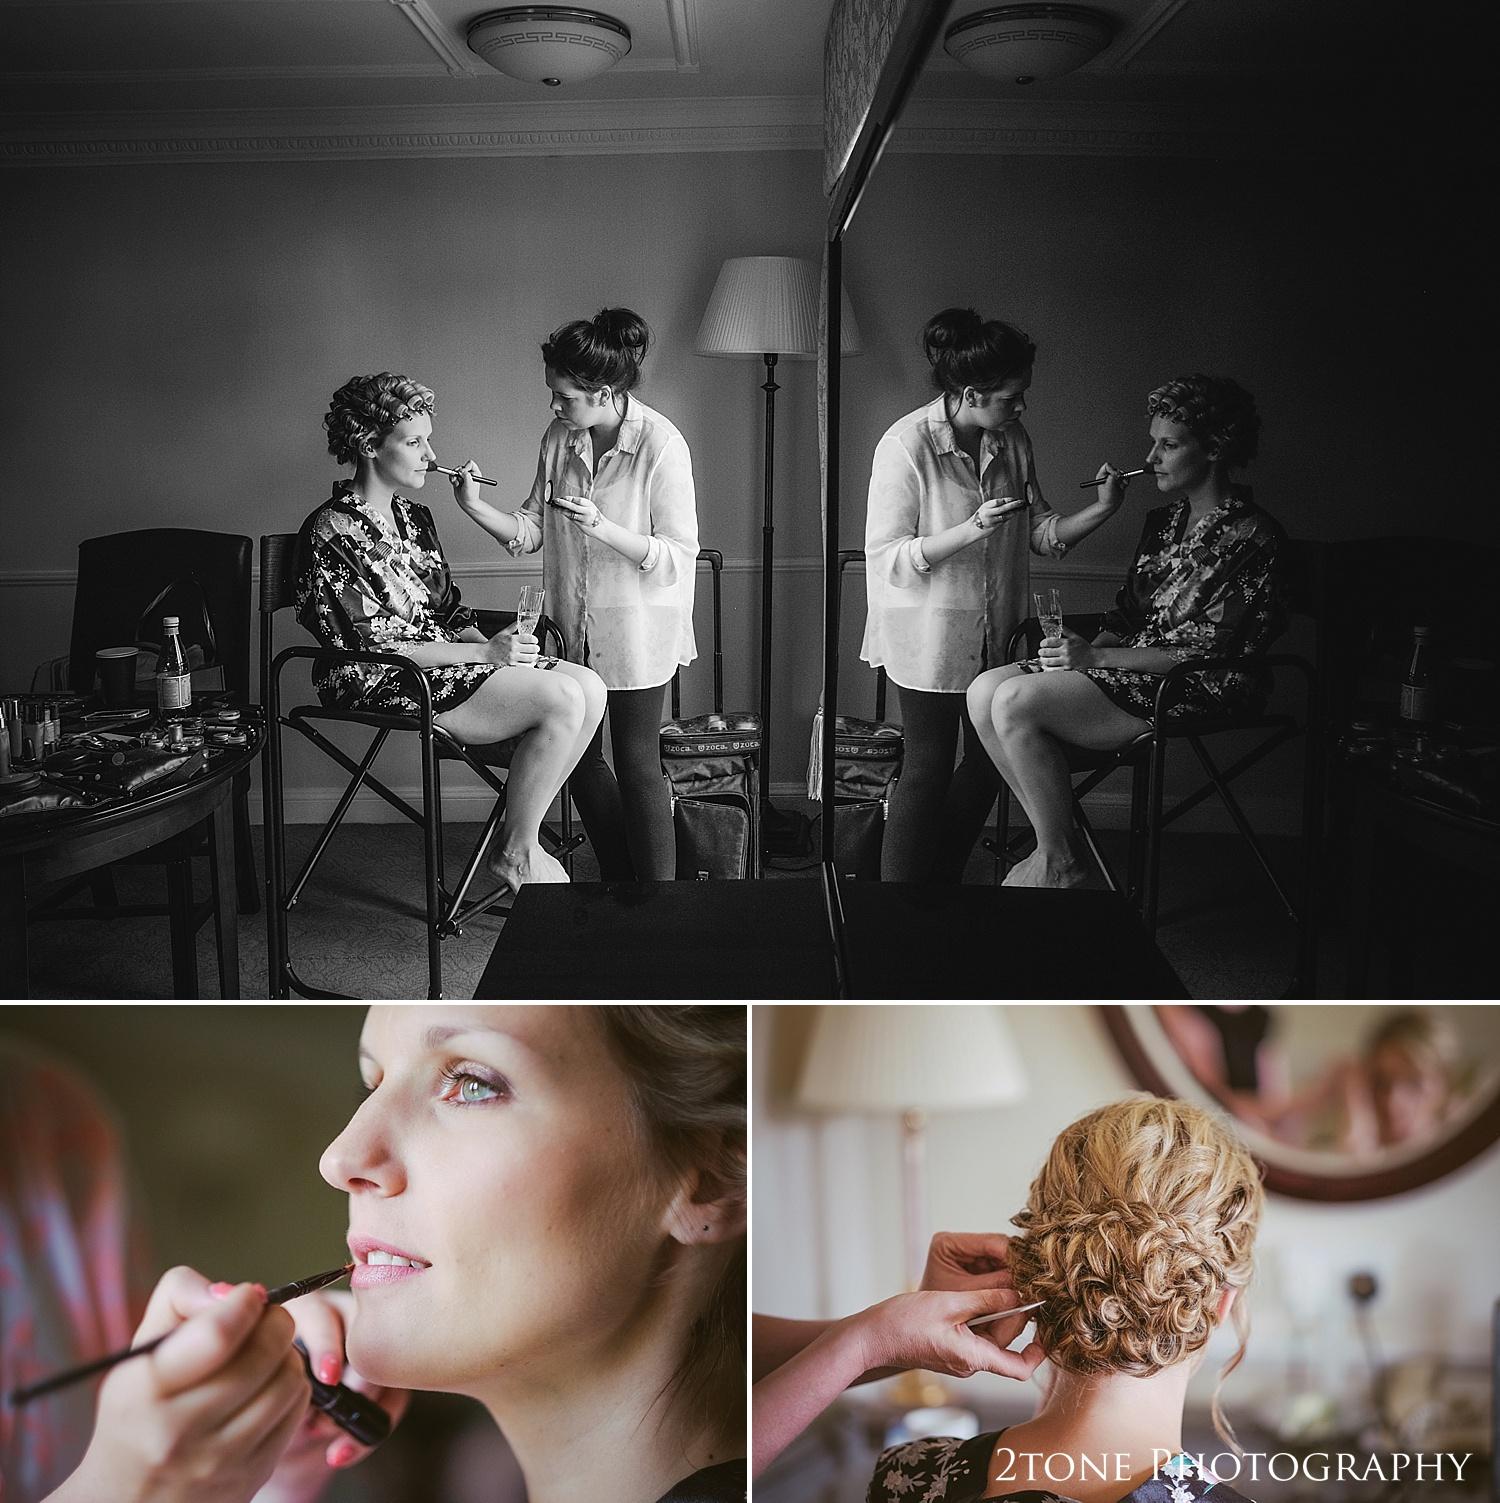 Bridal preparations.  Natural wedding photography in Durham by Durham based wedding photographers www.2tonephotography.co.uk